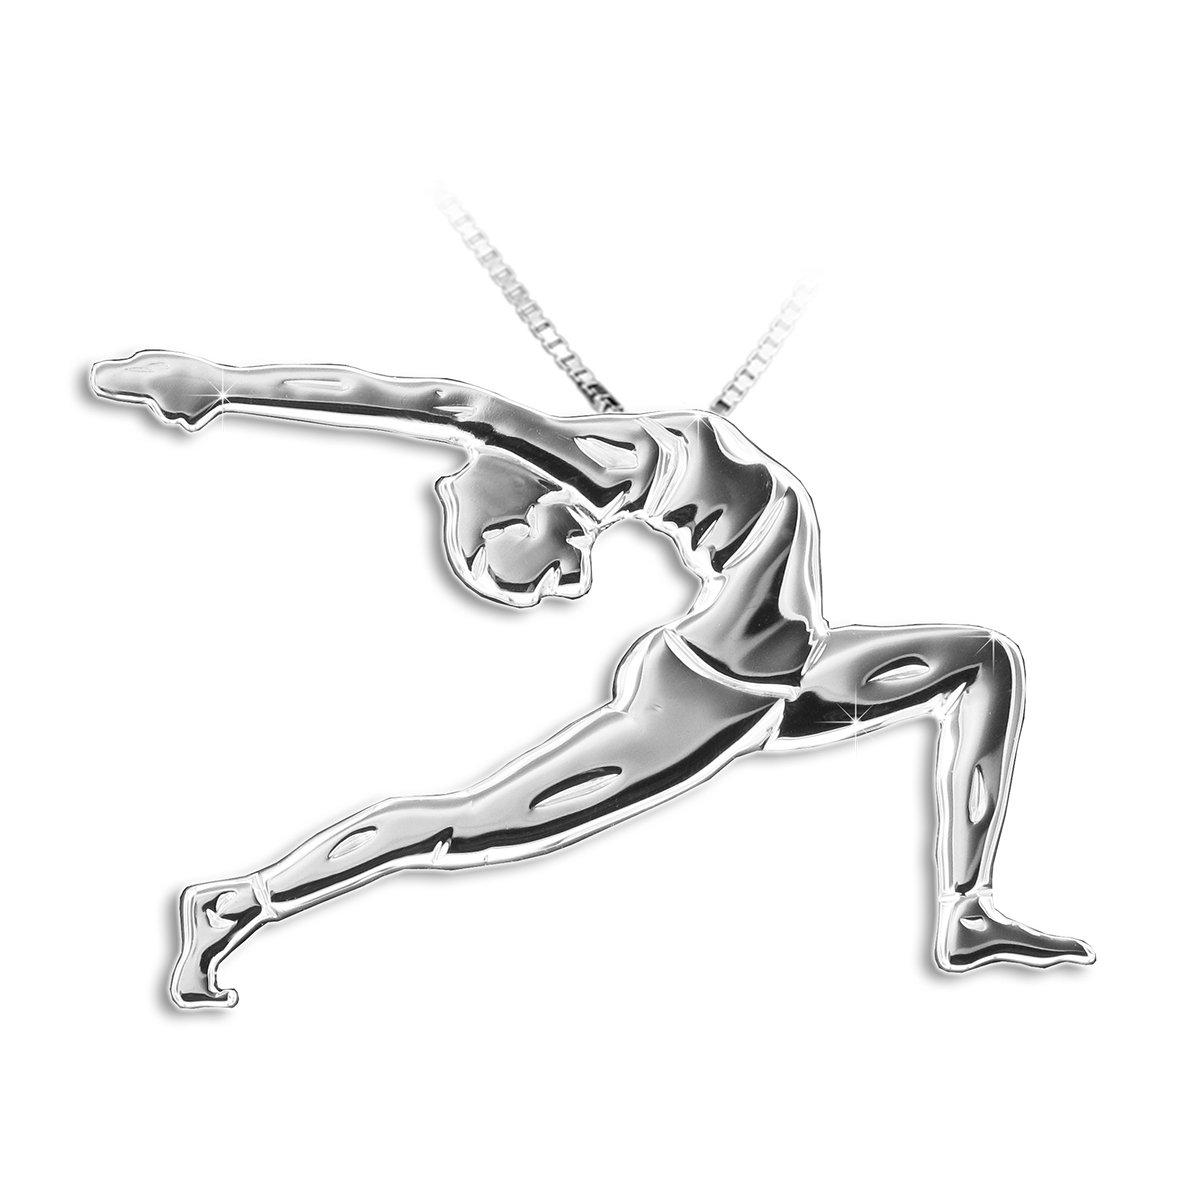 "UTTHITA ASHWA SANCHALASANA Equestrian Pose /""Sun Salutation/"" MIKELART Yoga Jewellery Pendant"